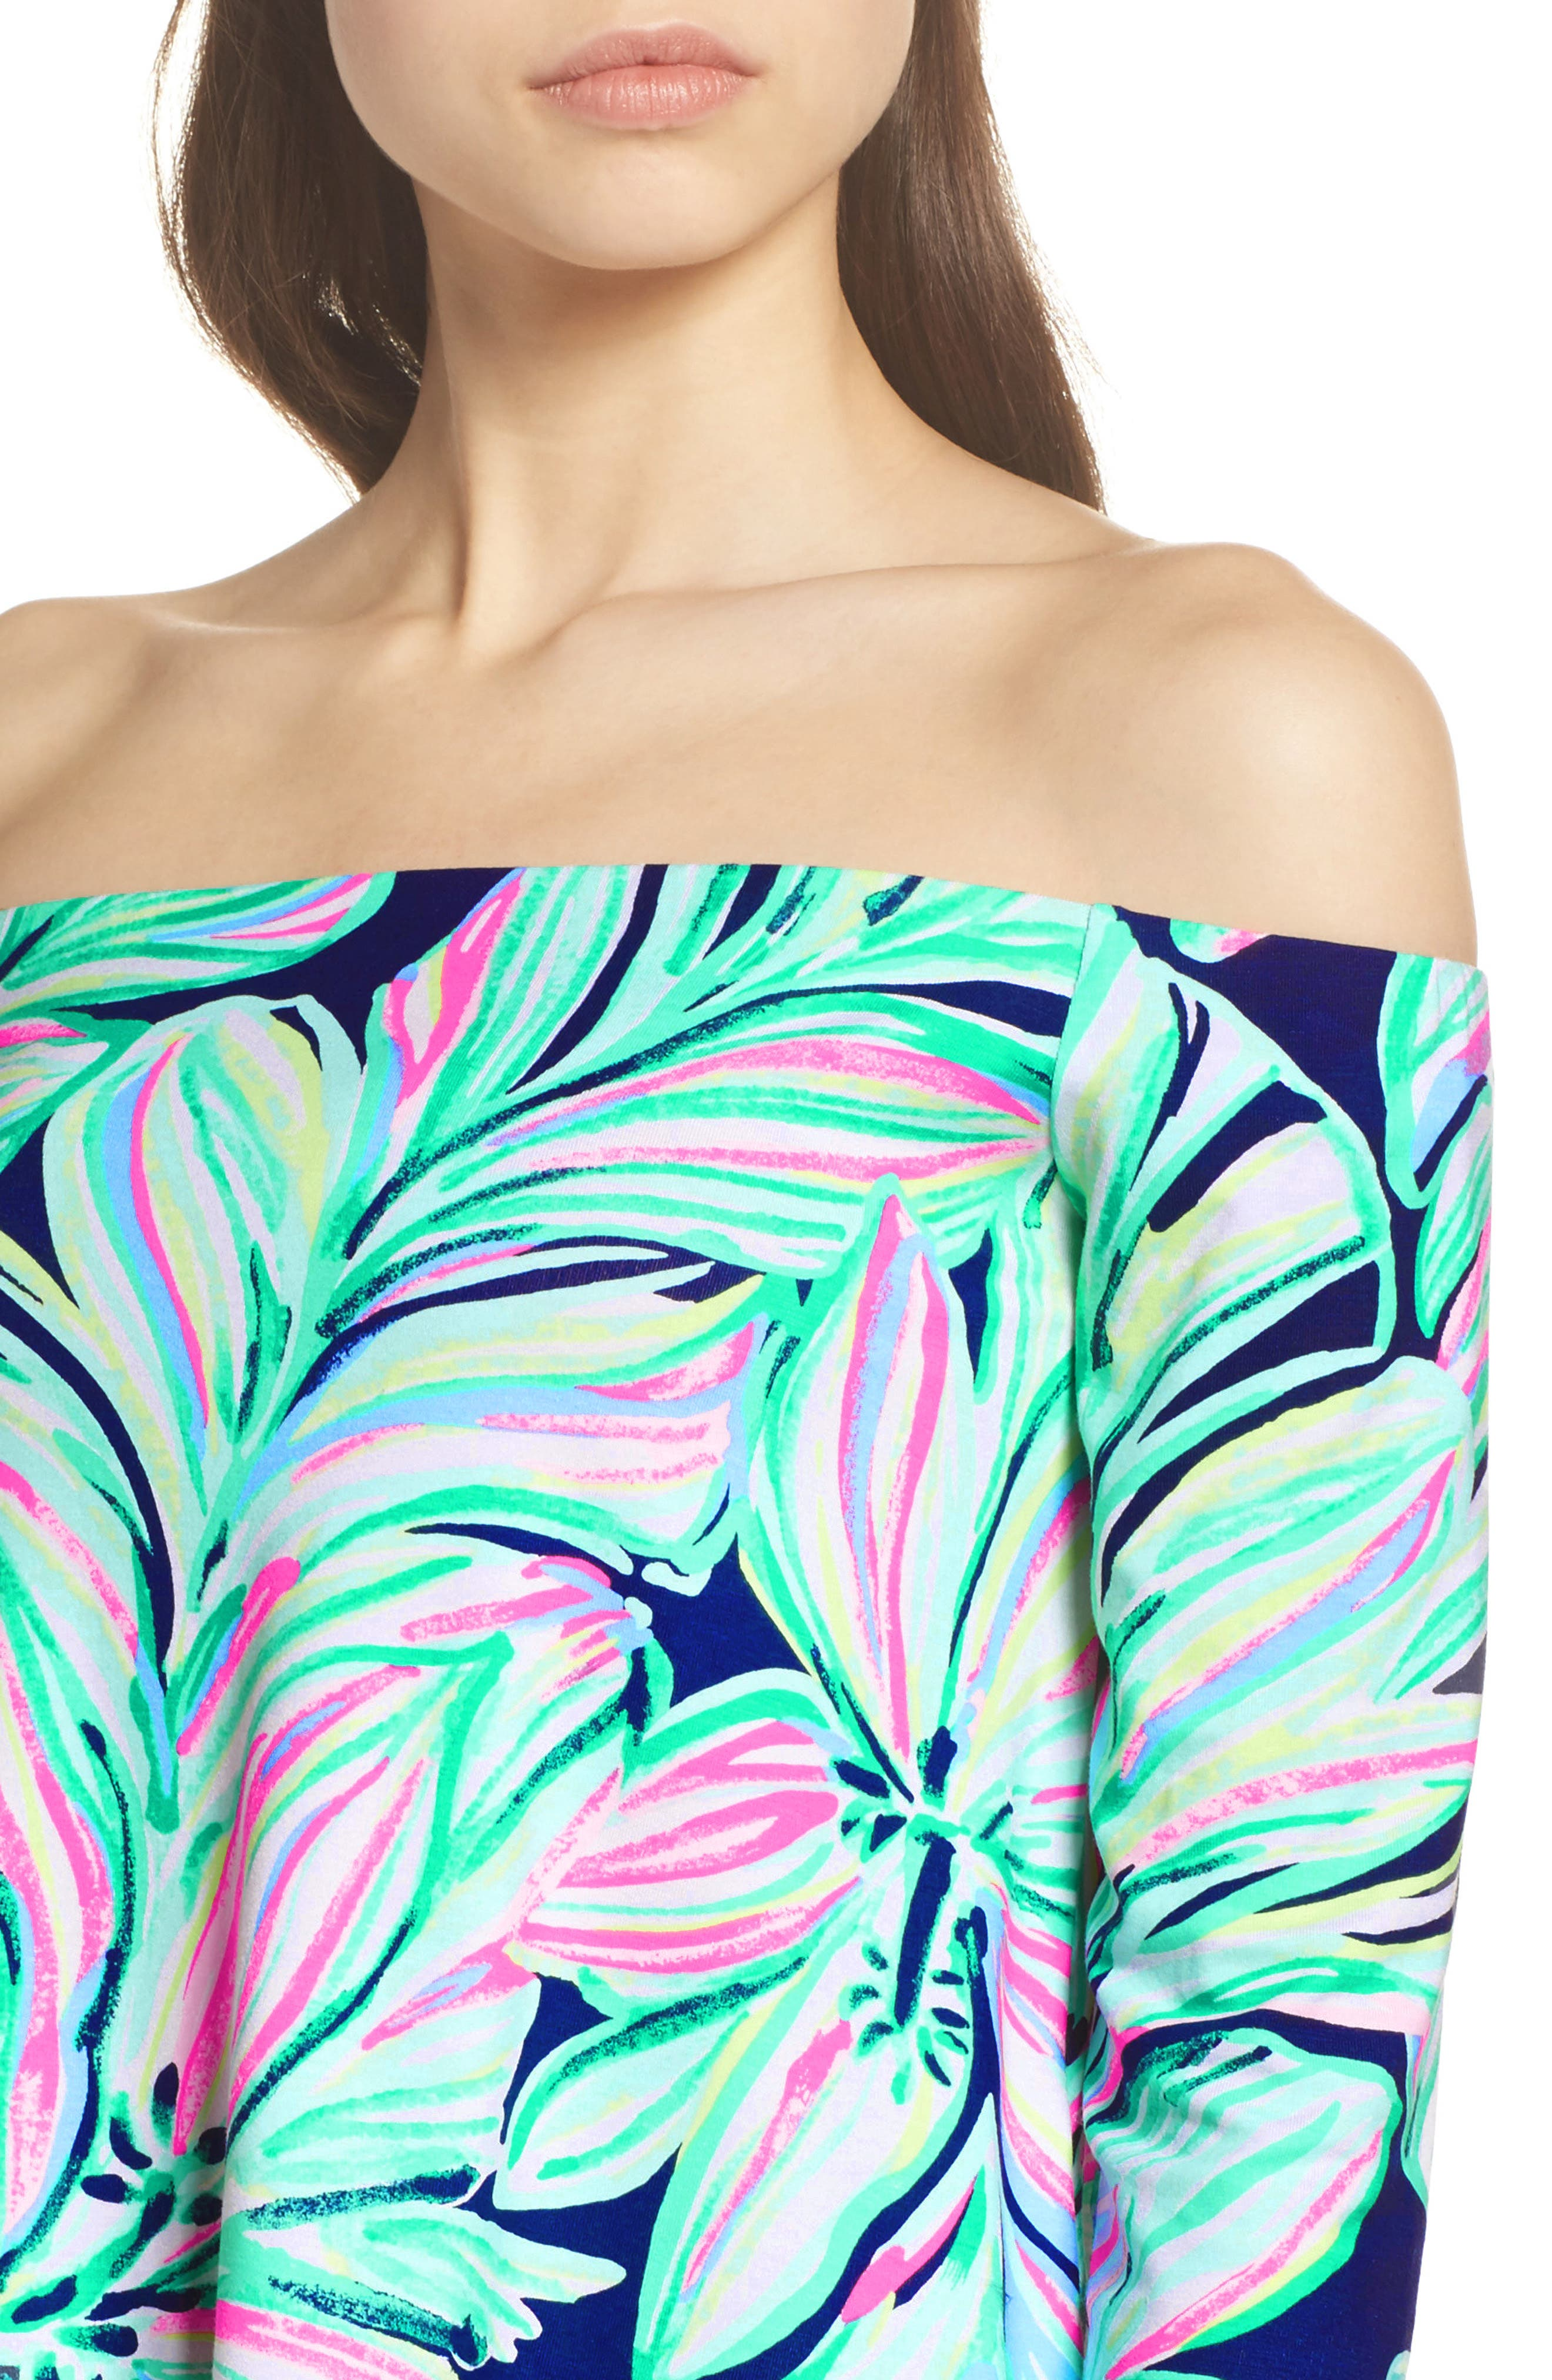 Weslee Floral Top & Pants,                             Alternate thumbnail 4, color,